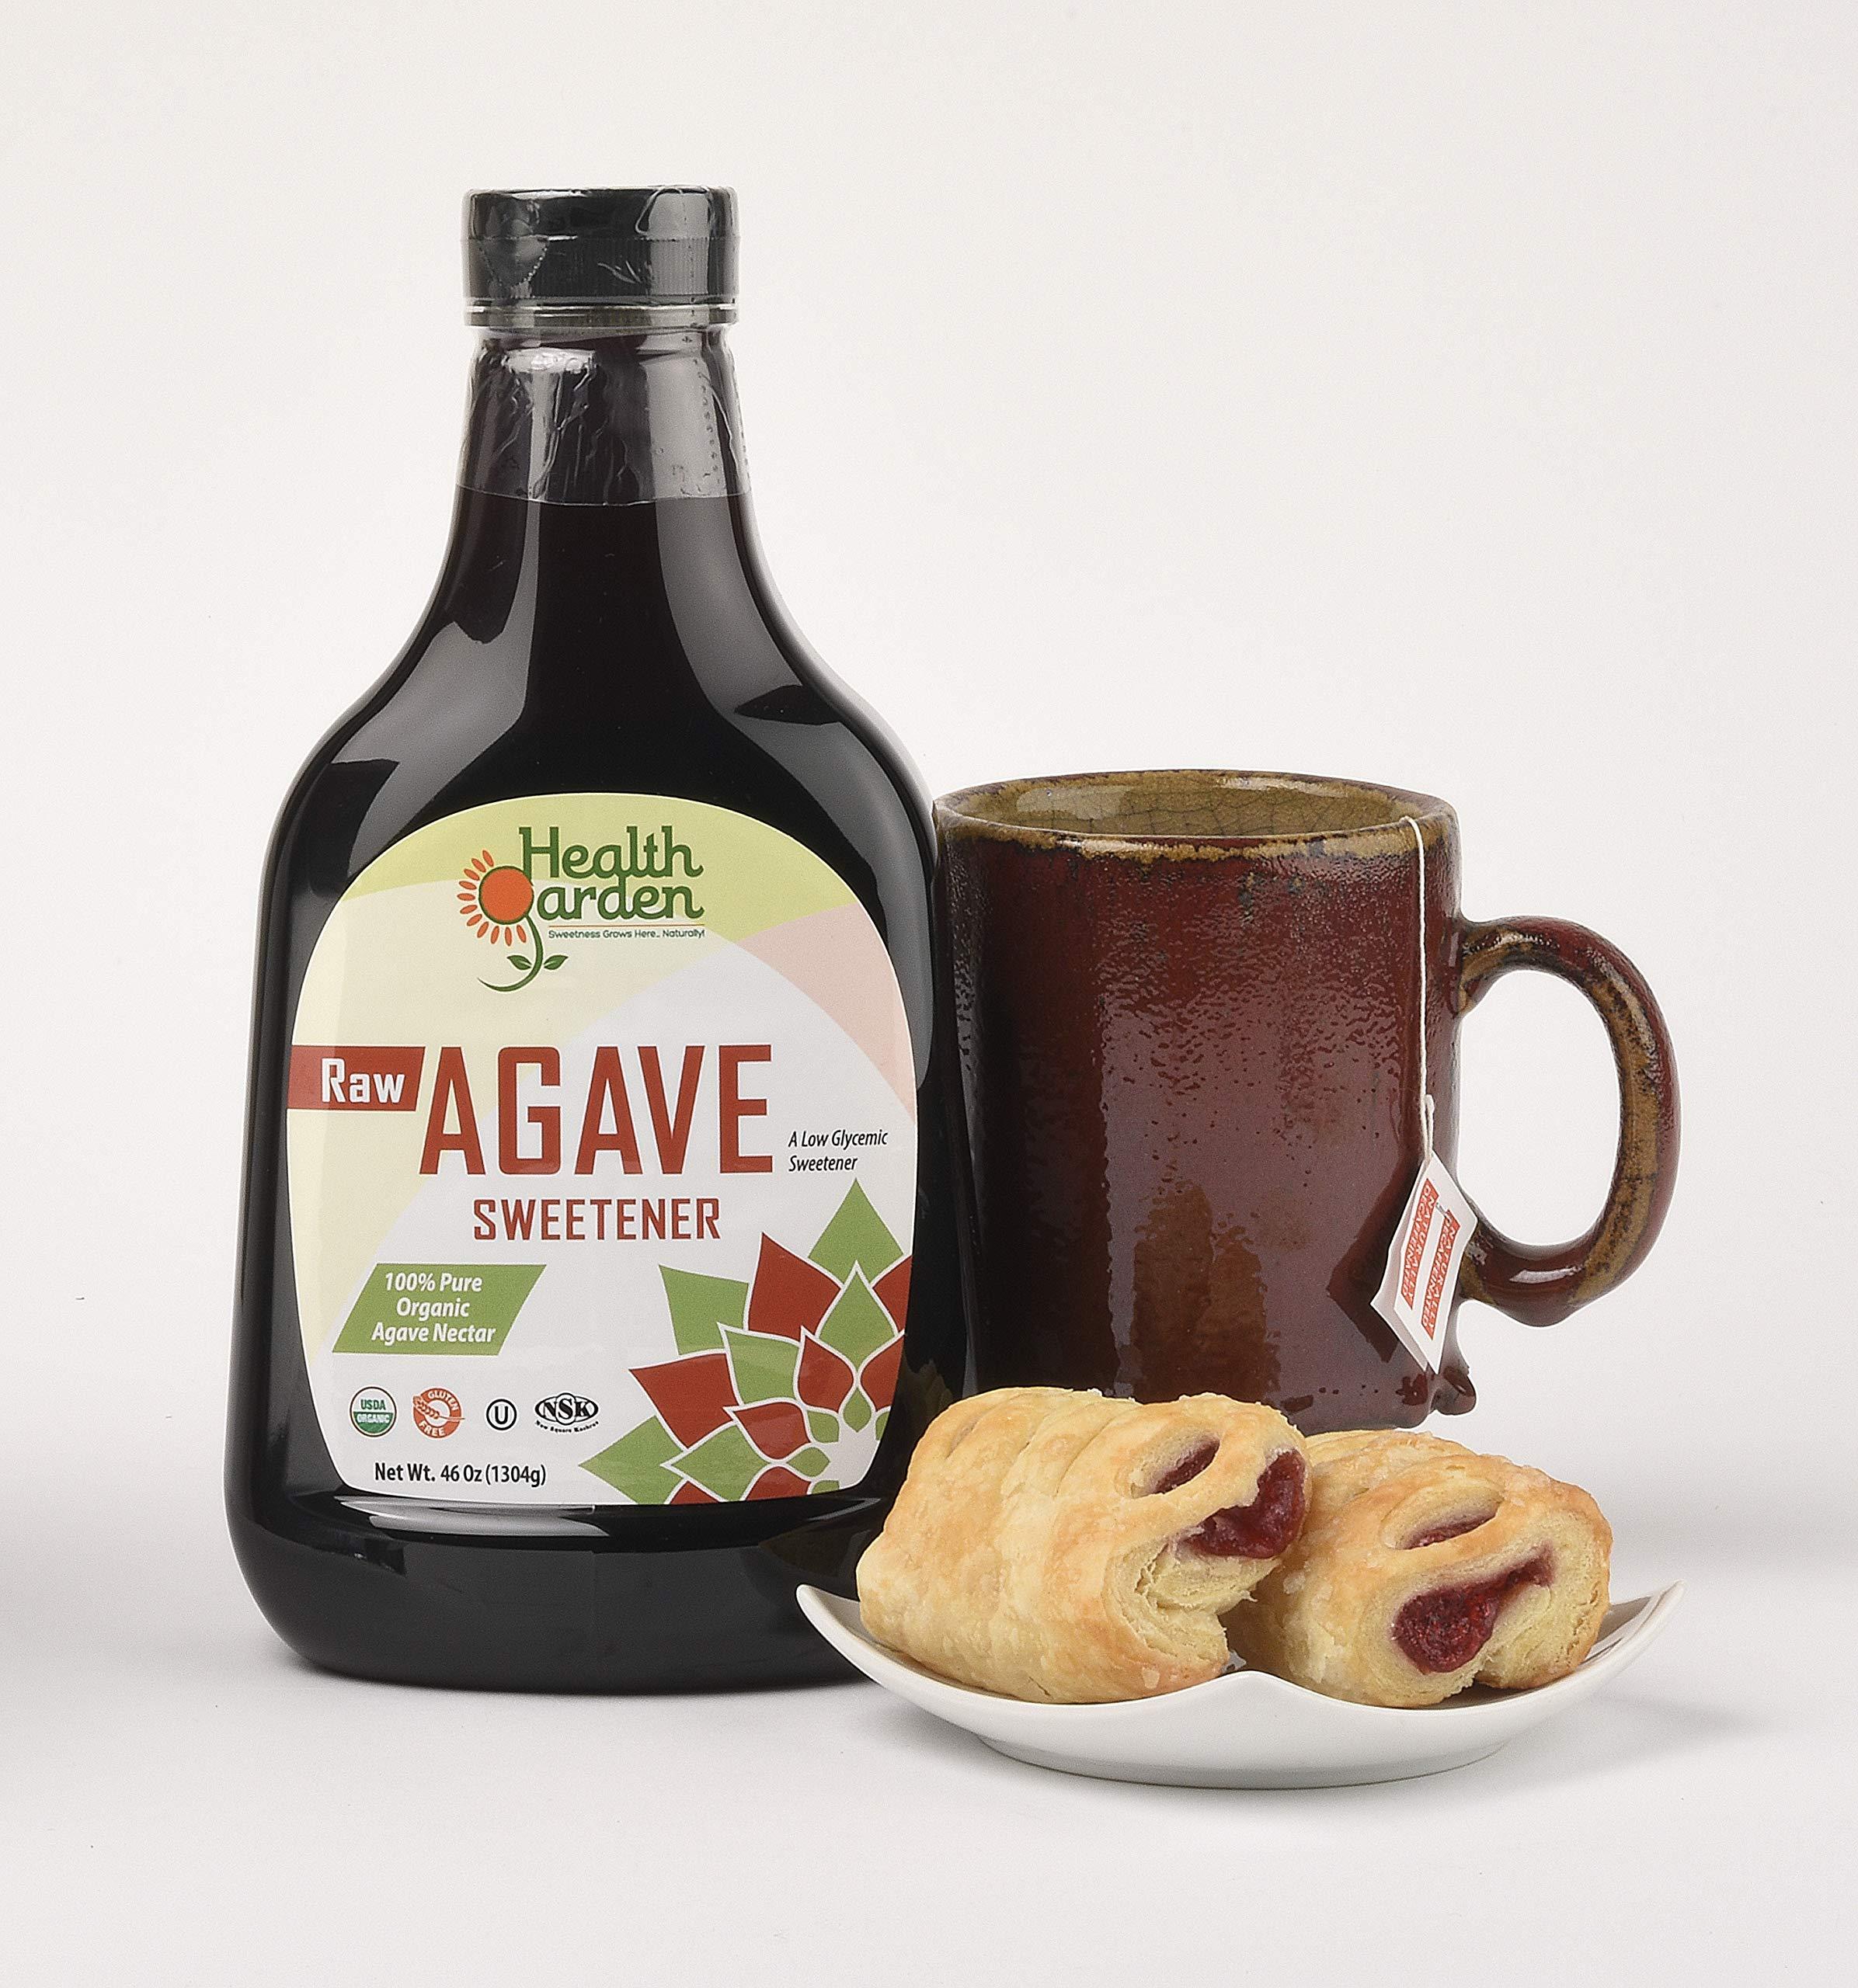 Health Garden Organic Raw Agave Nectar Sweetener, 46 oz (pack of 5) by HEALTH GARDEN (Image #3)